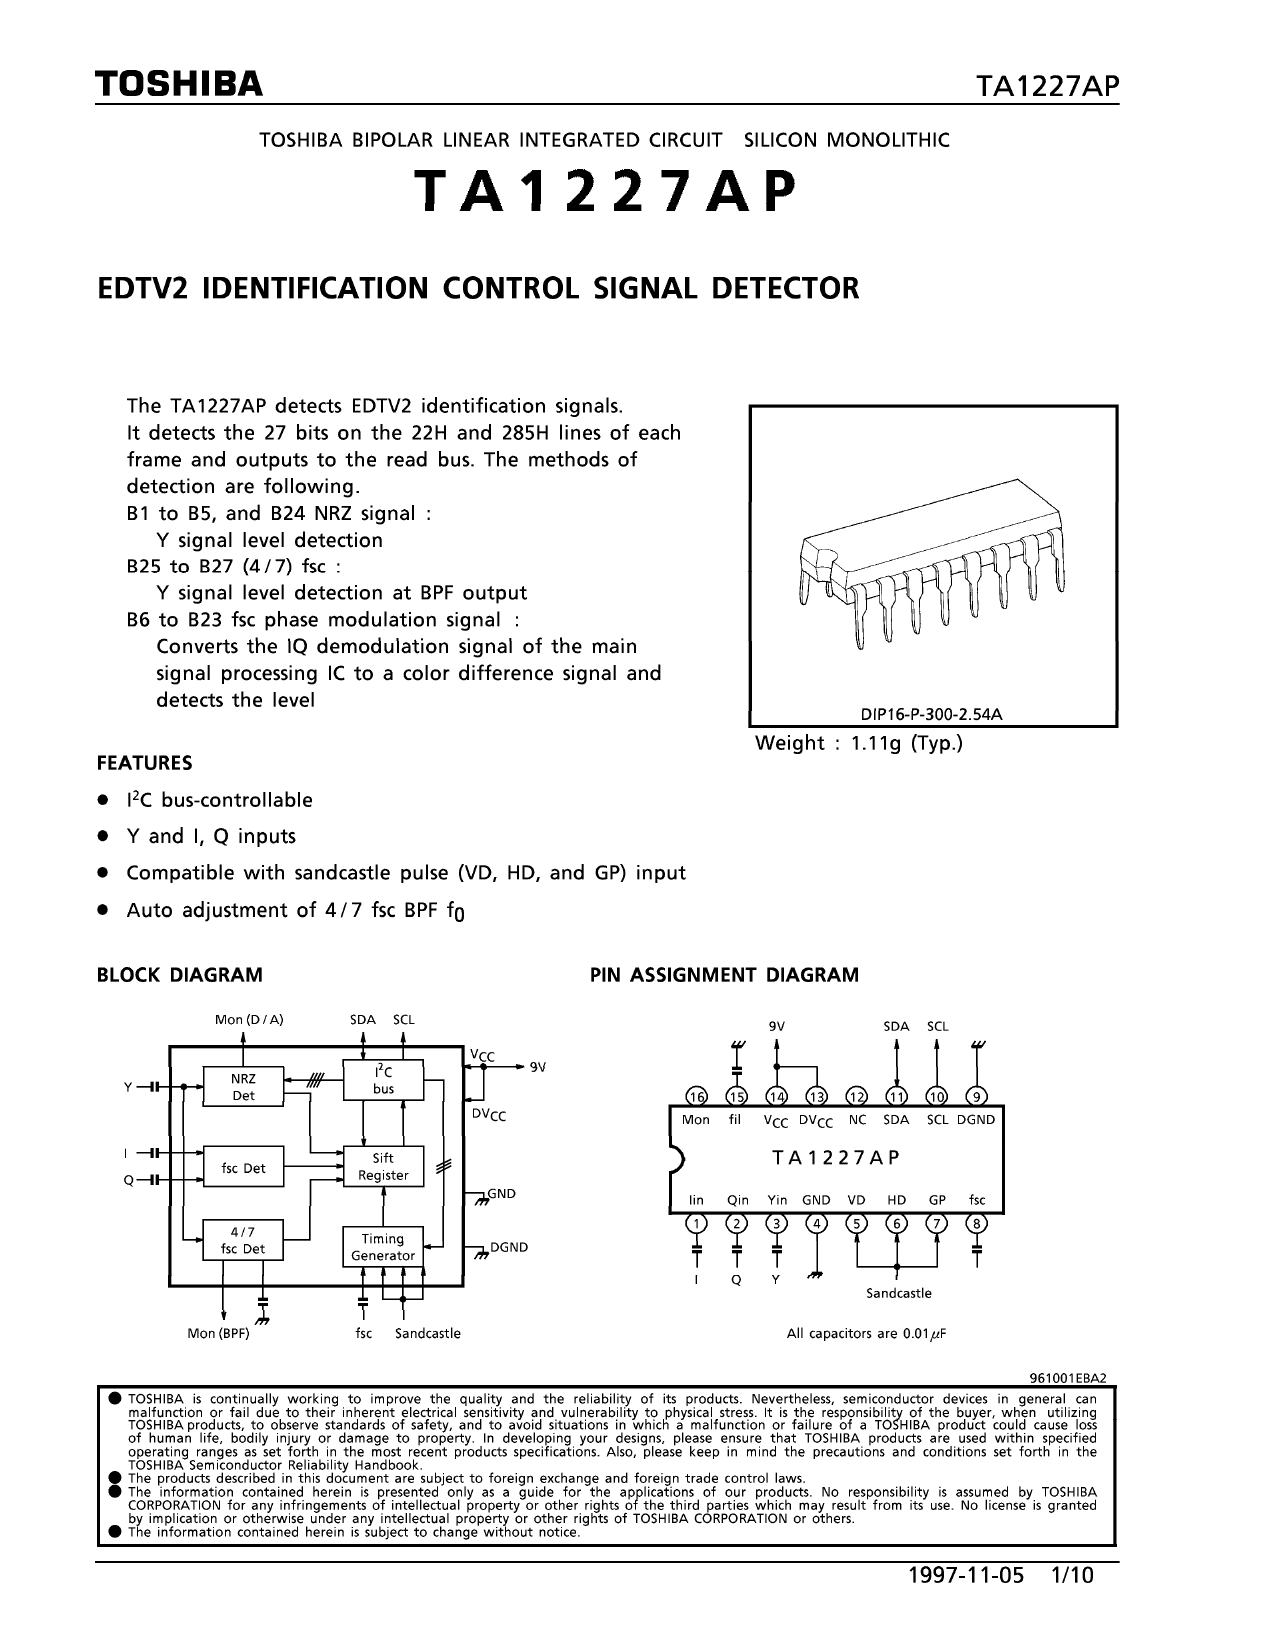 TA1227AP image